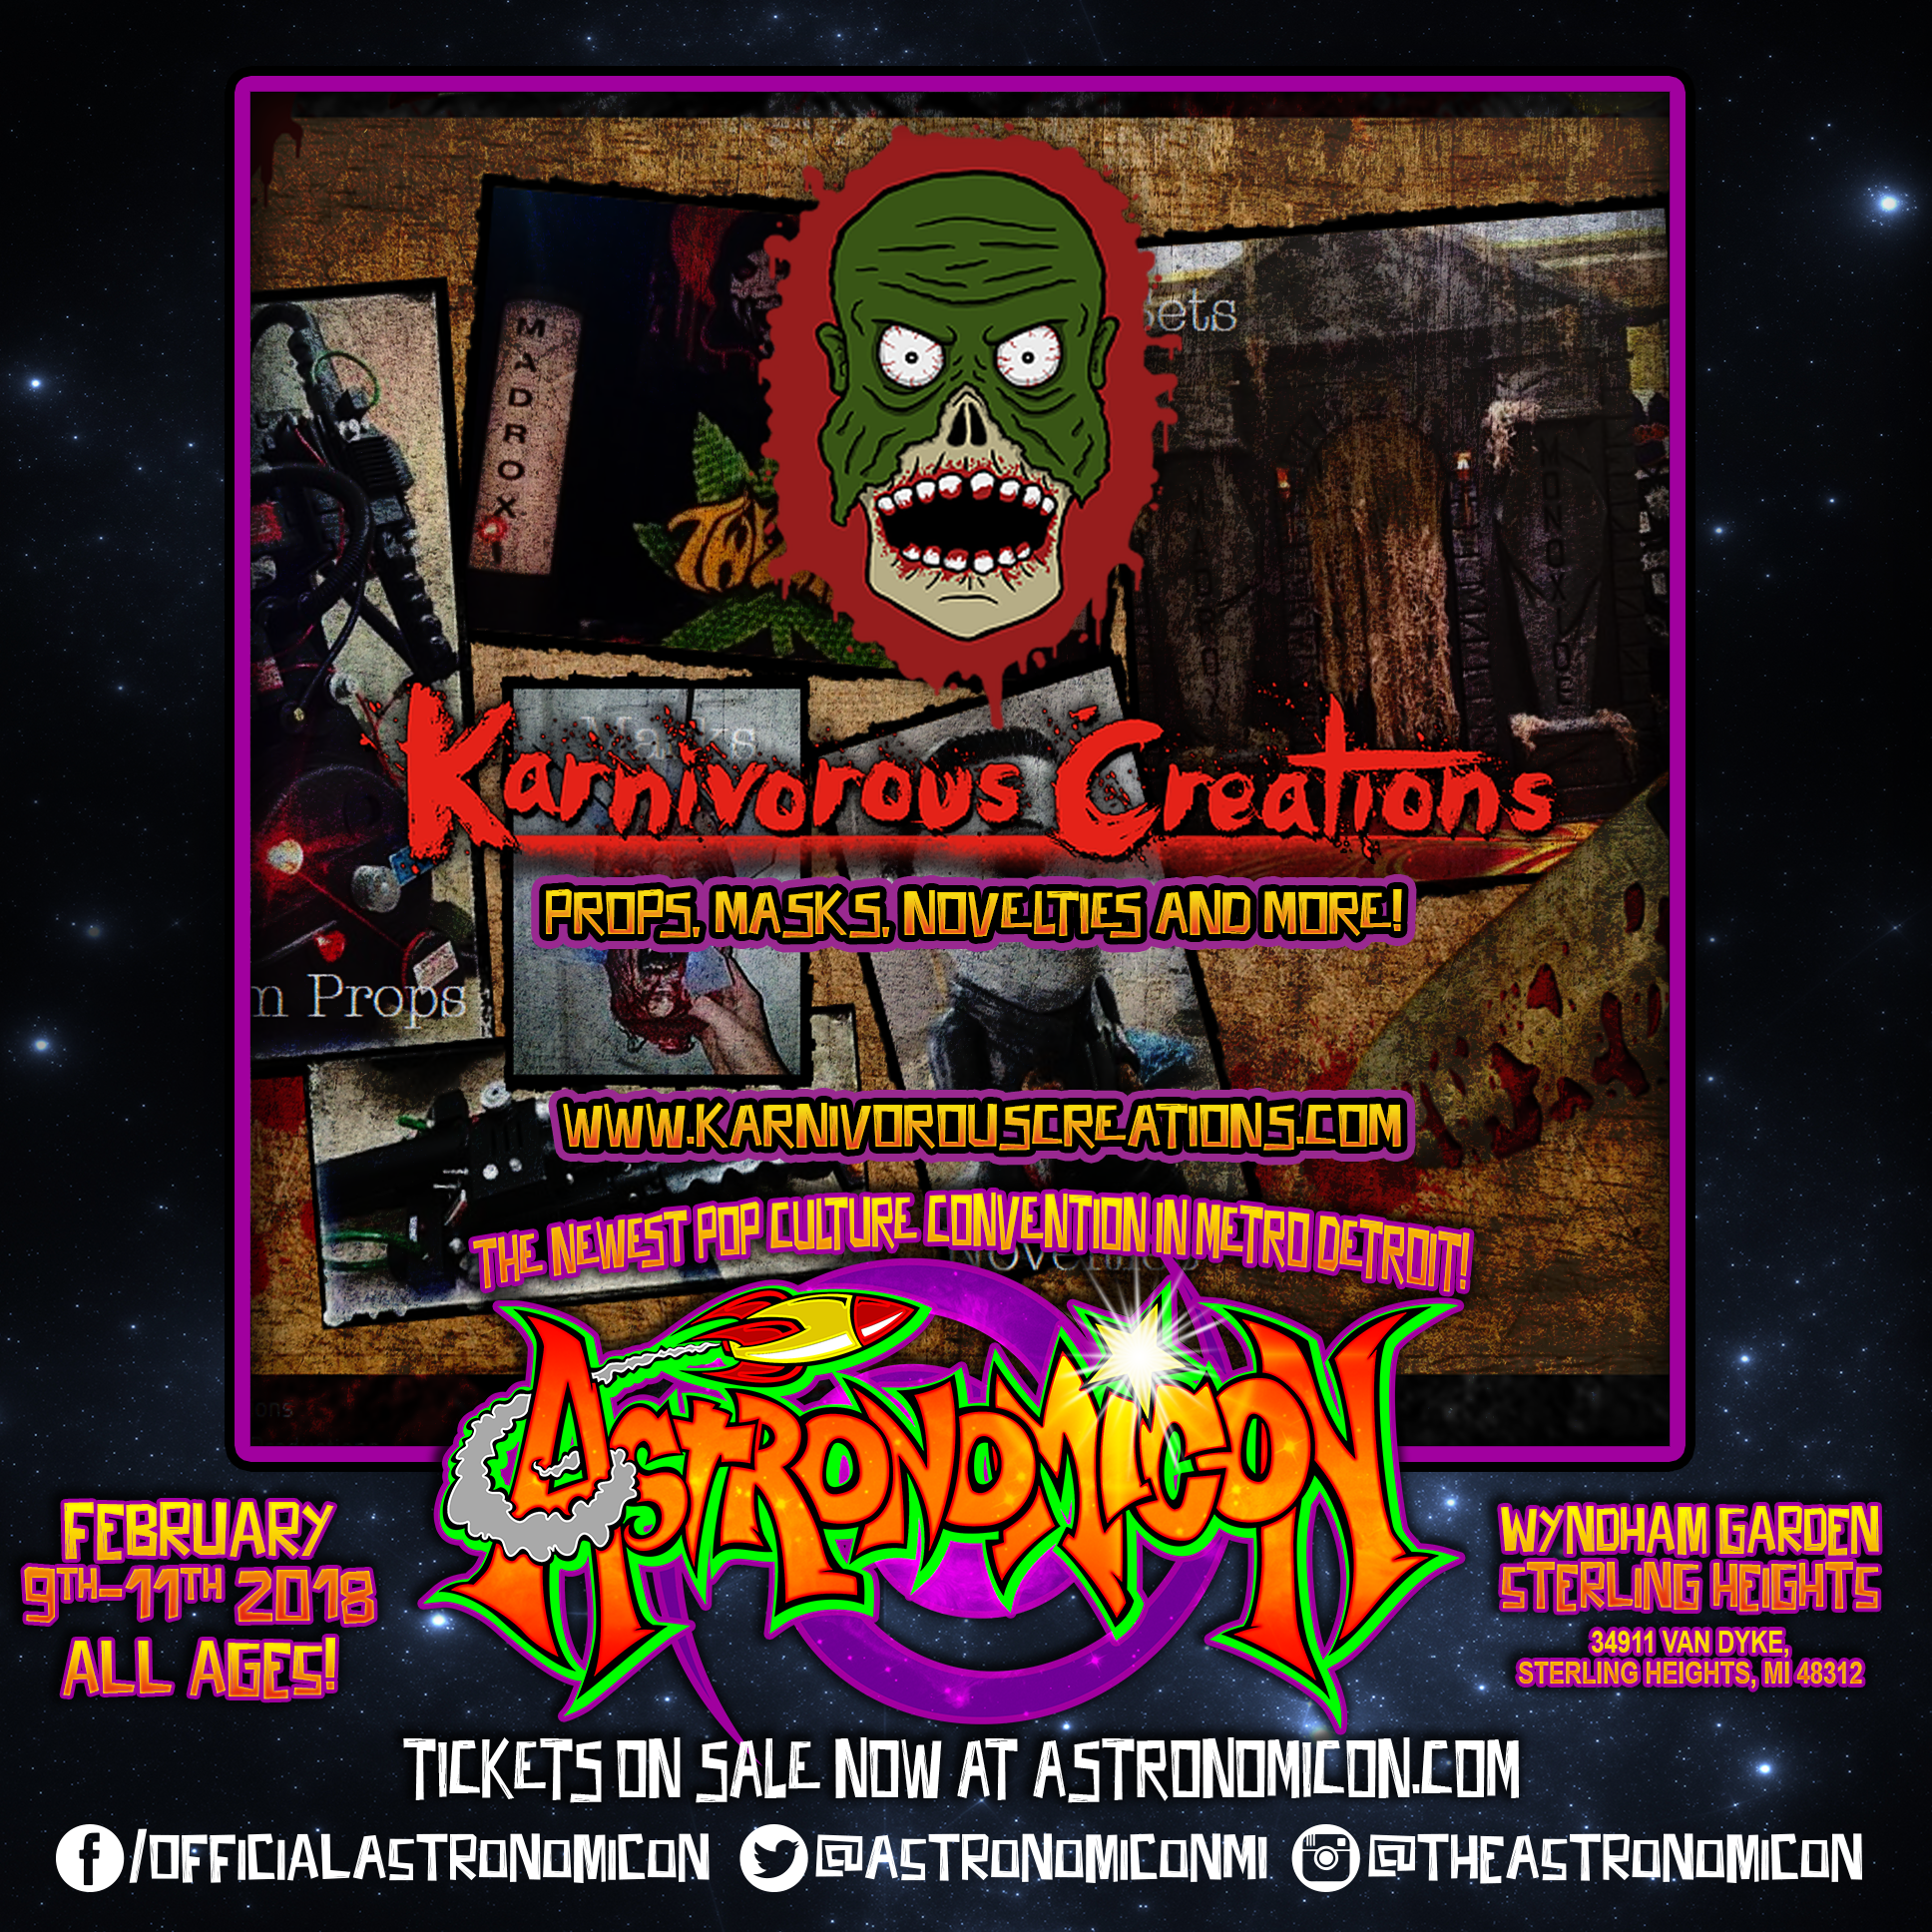 Karnivorous Creations -  www.karnivorouscreations.com